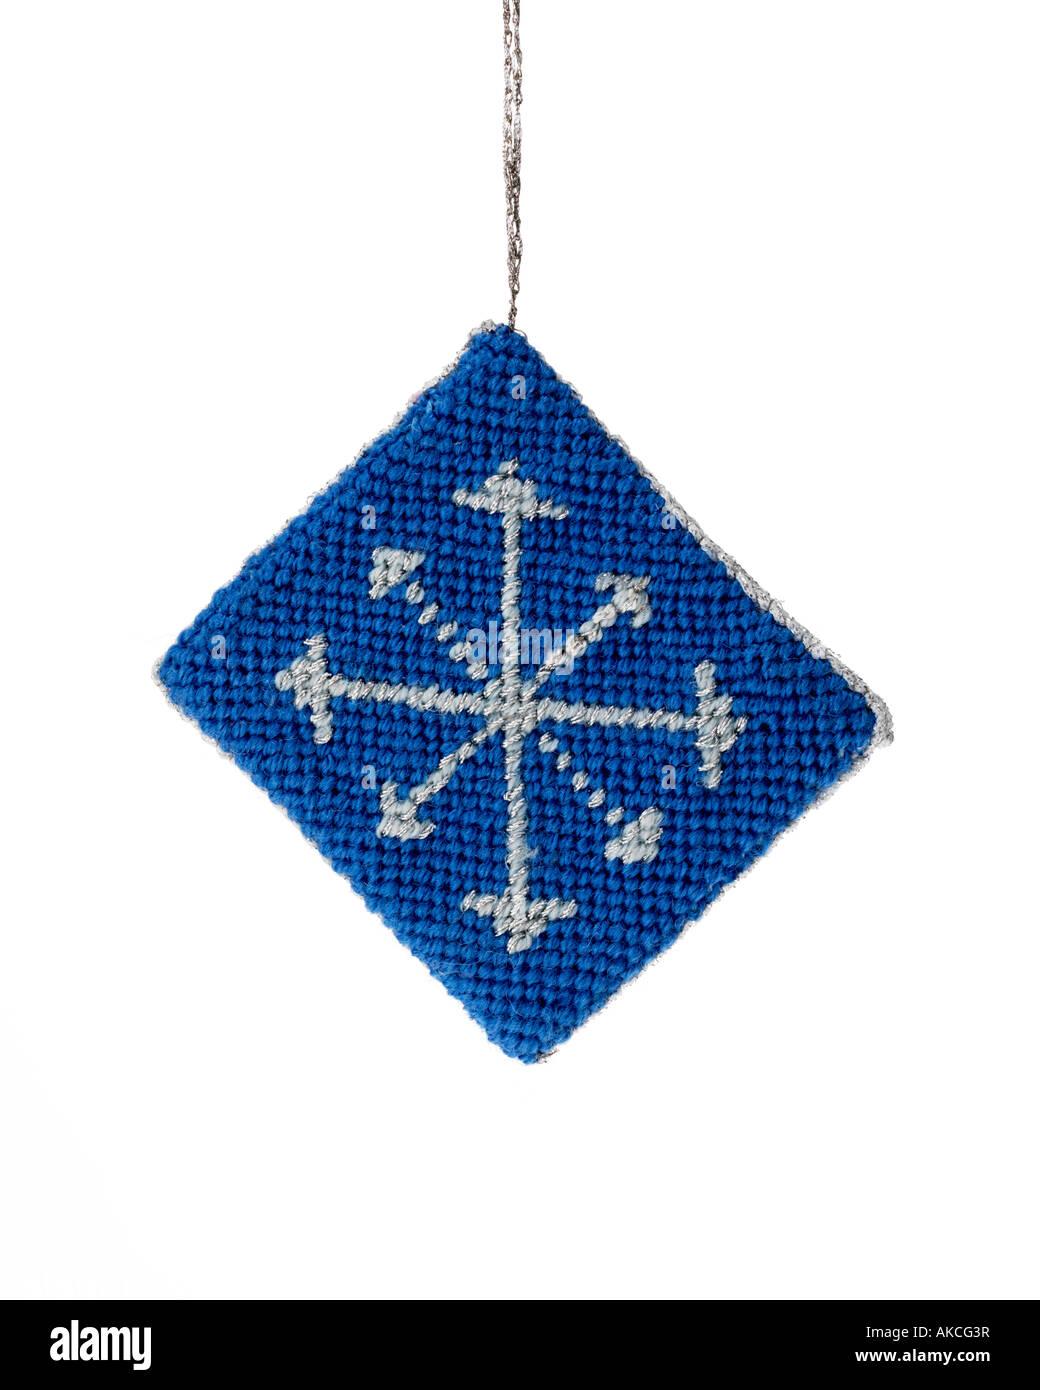 Needlepoint Christmas Ornament Stock Photo 14957866 Alamy